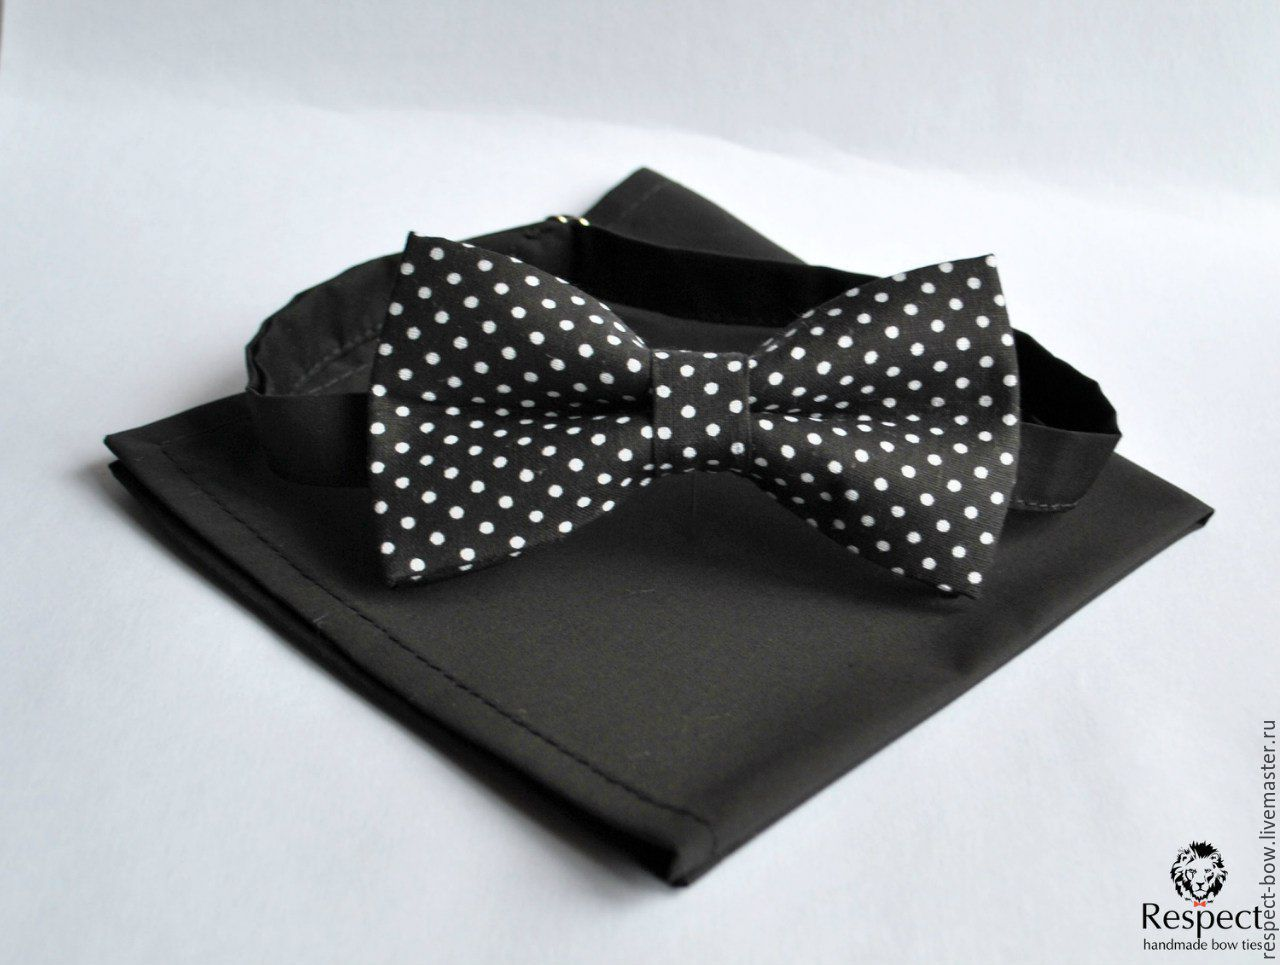 Tie black polka dot Aesthetics pocket square black, Ties, Moscow,  Фото №1